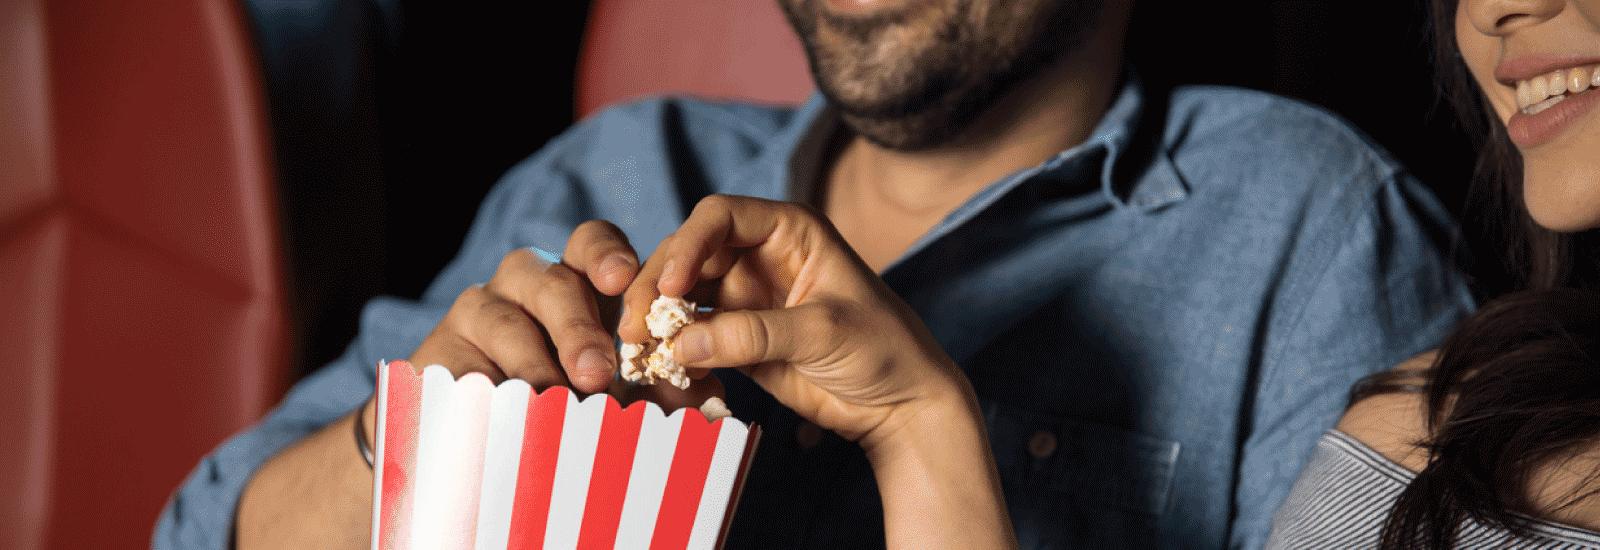 Eglin AFB Movie Theater